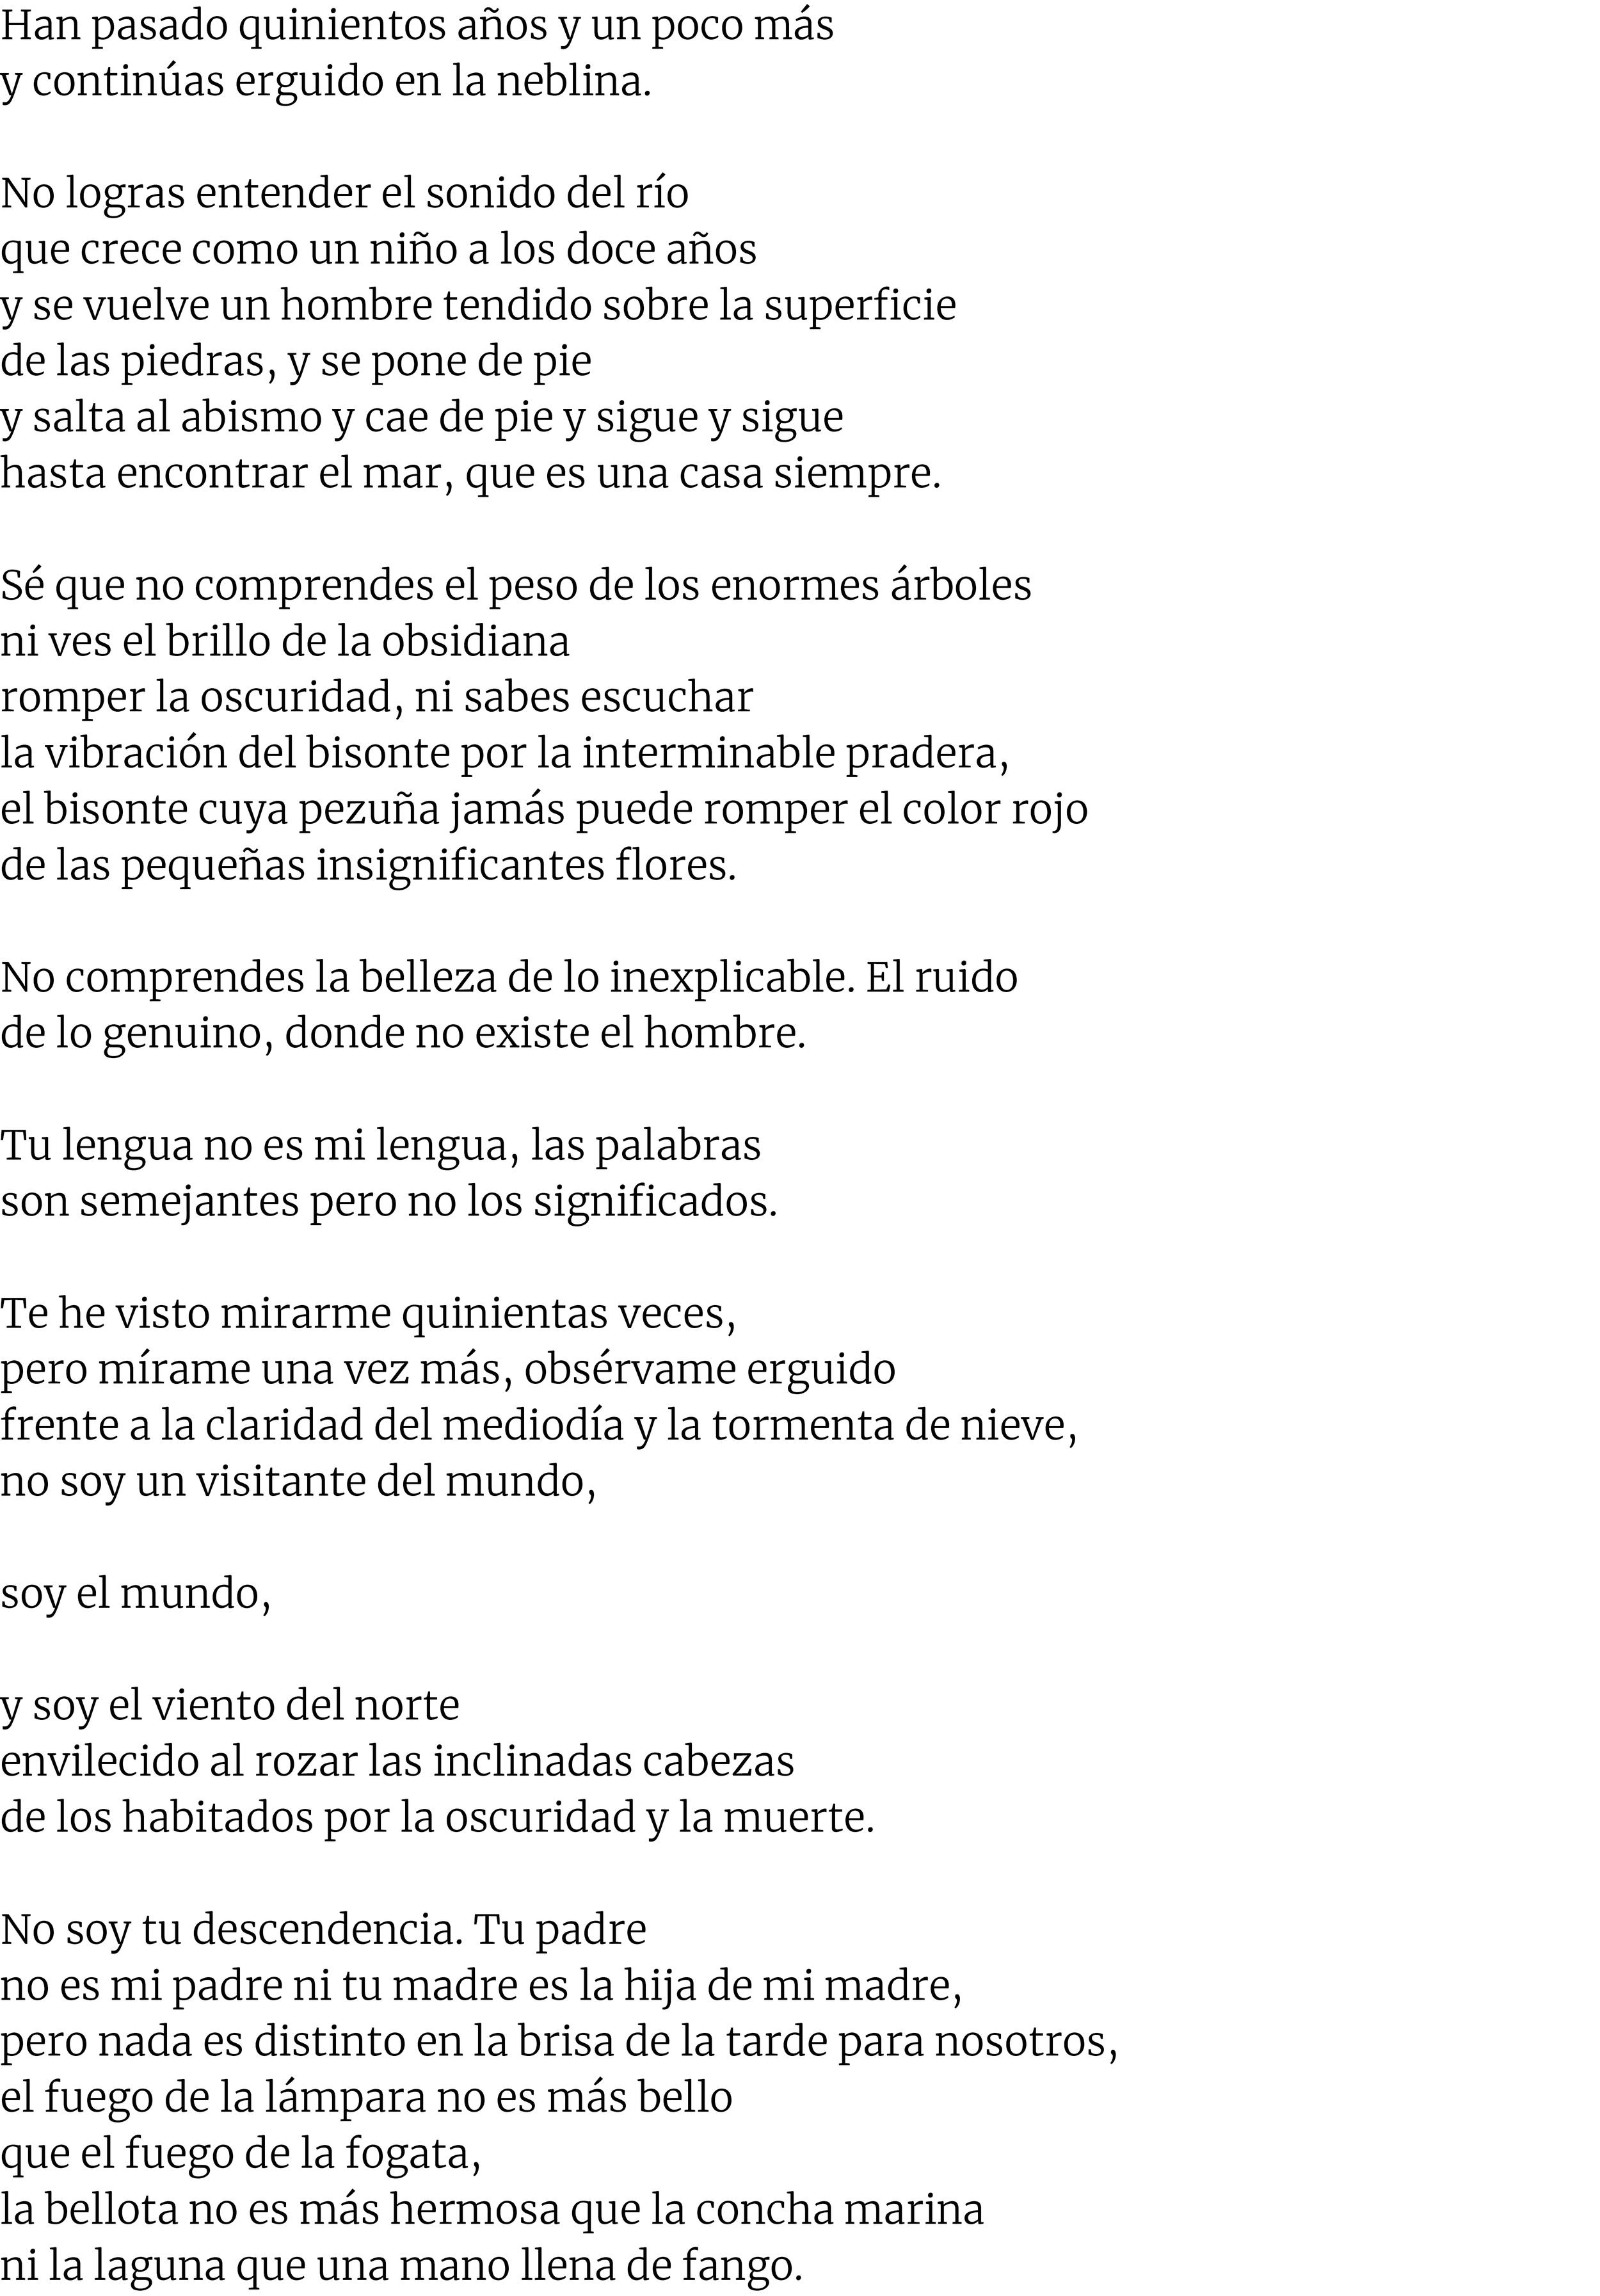 ES Jorge Galán3.png